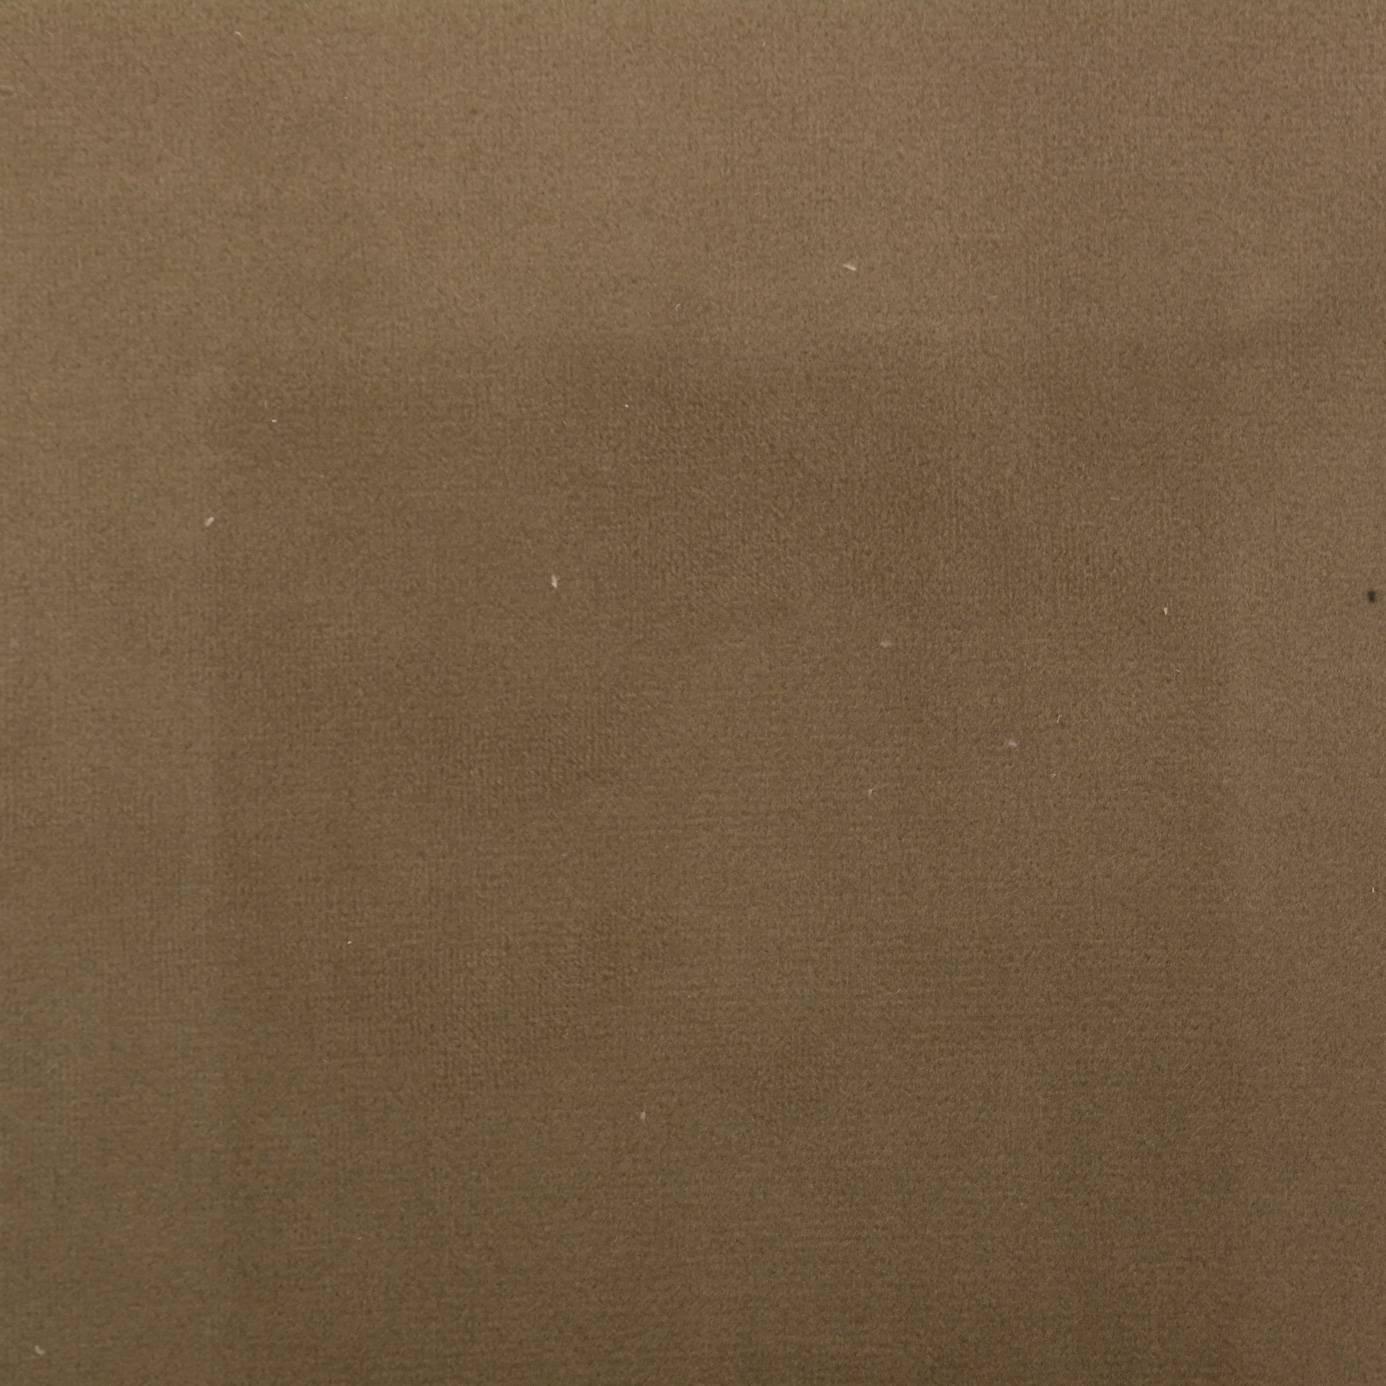 Plush Velvet Fabric Bark Plushvbark Warwick Plush